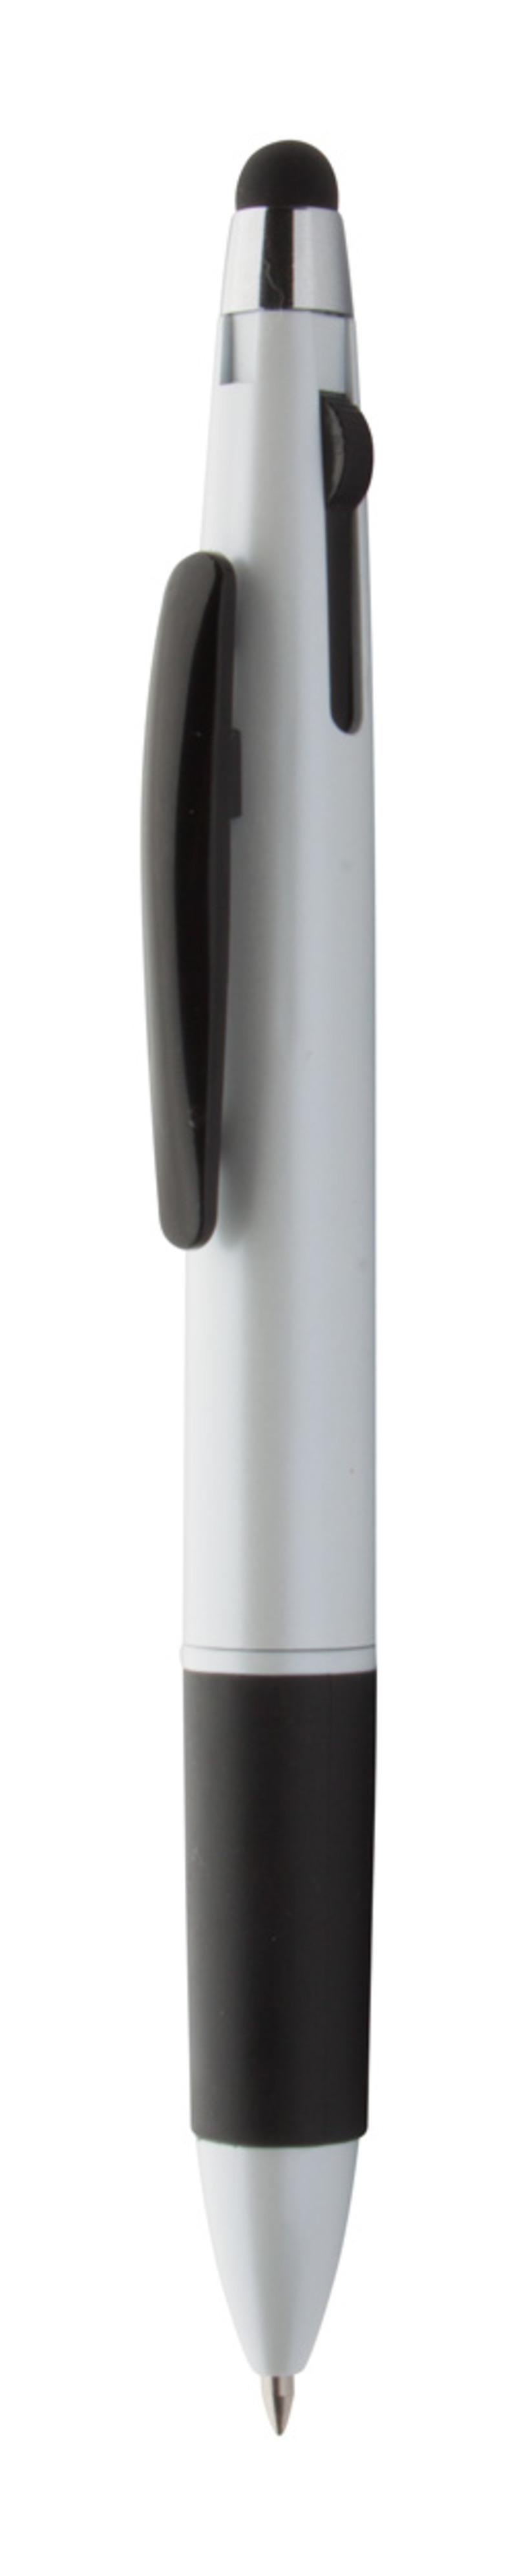 Tricket touch ballpoint pen